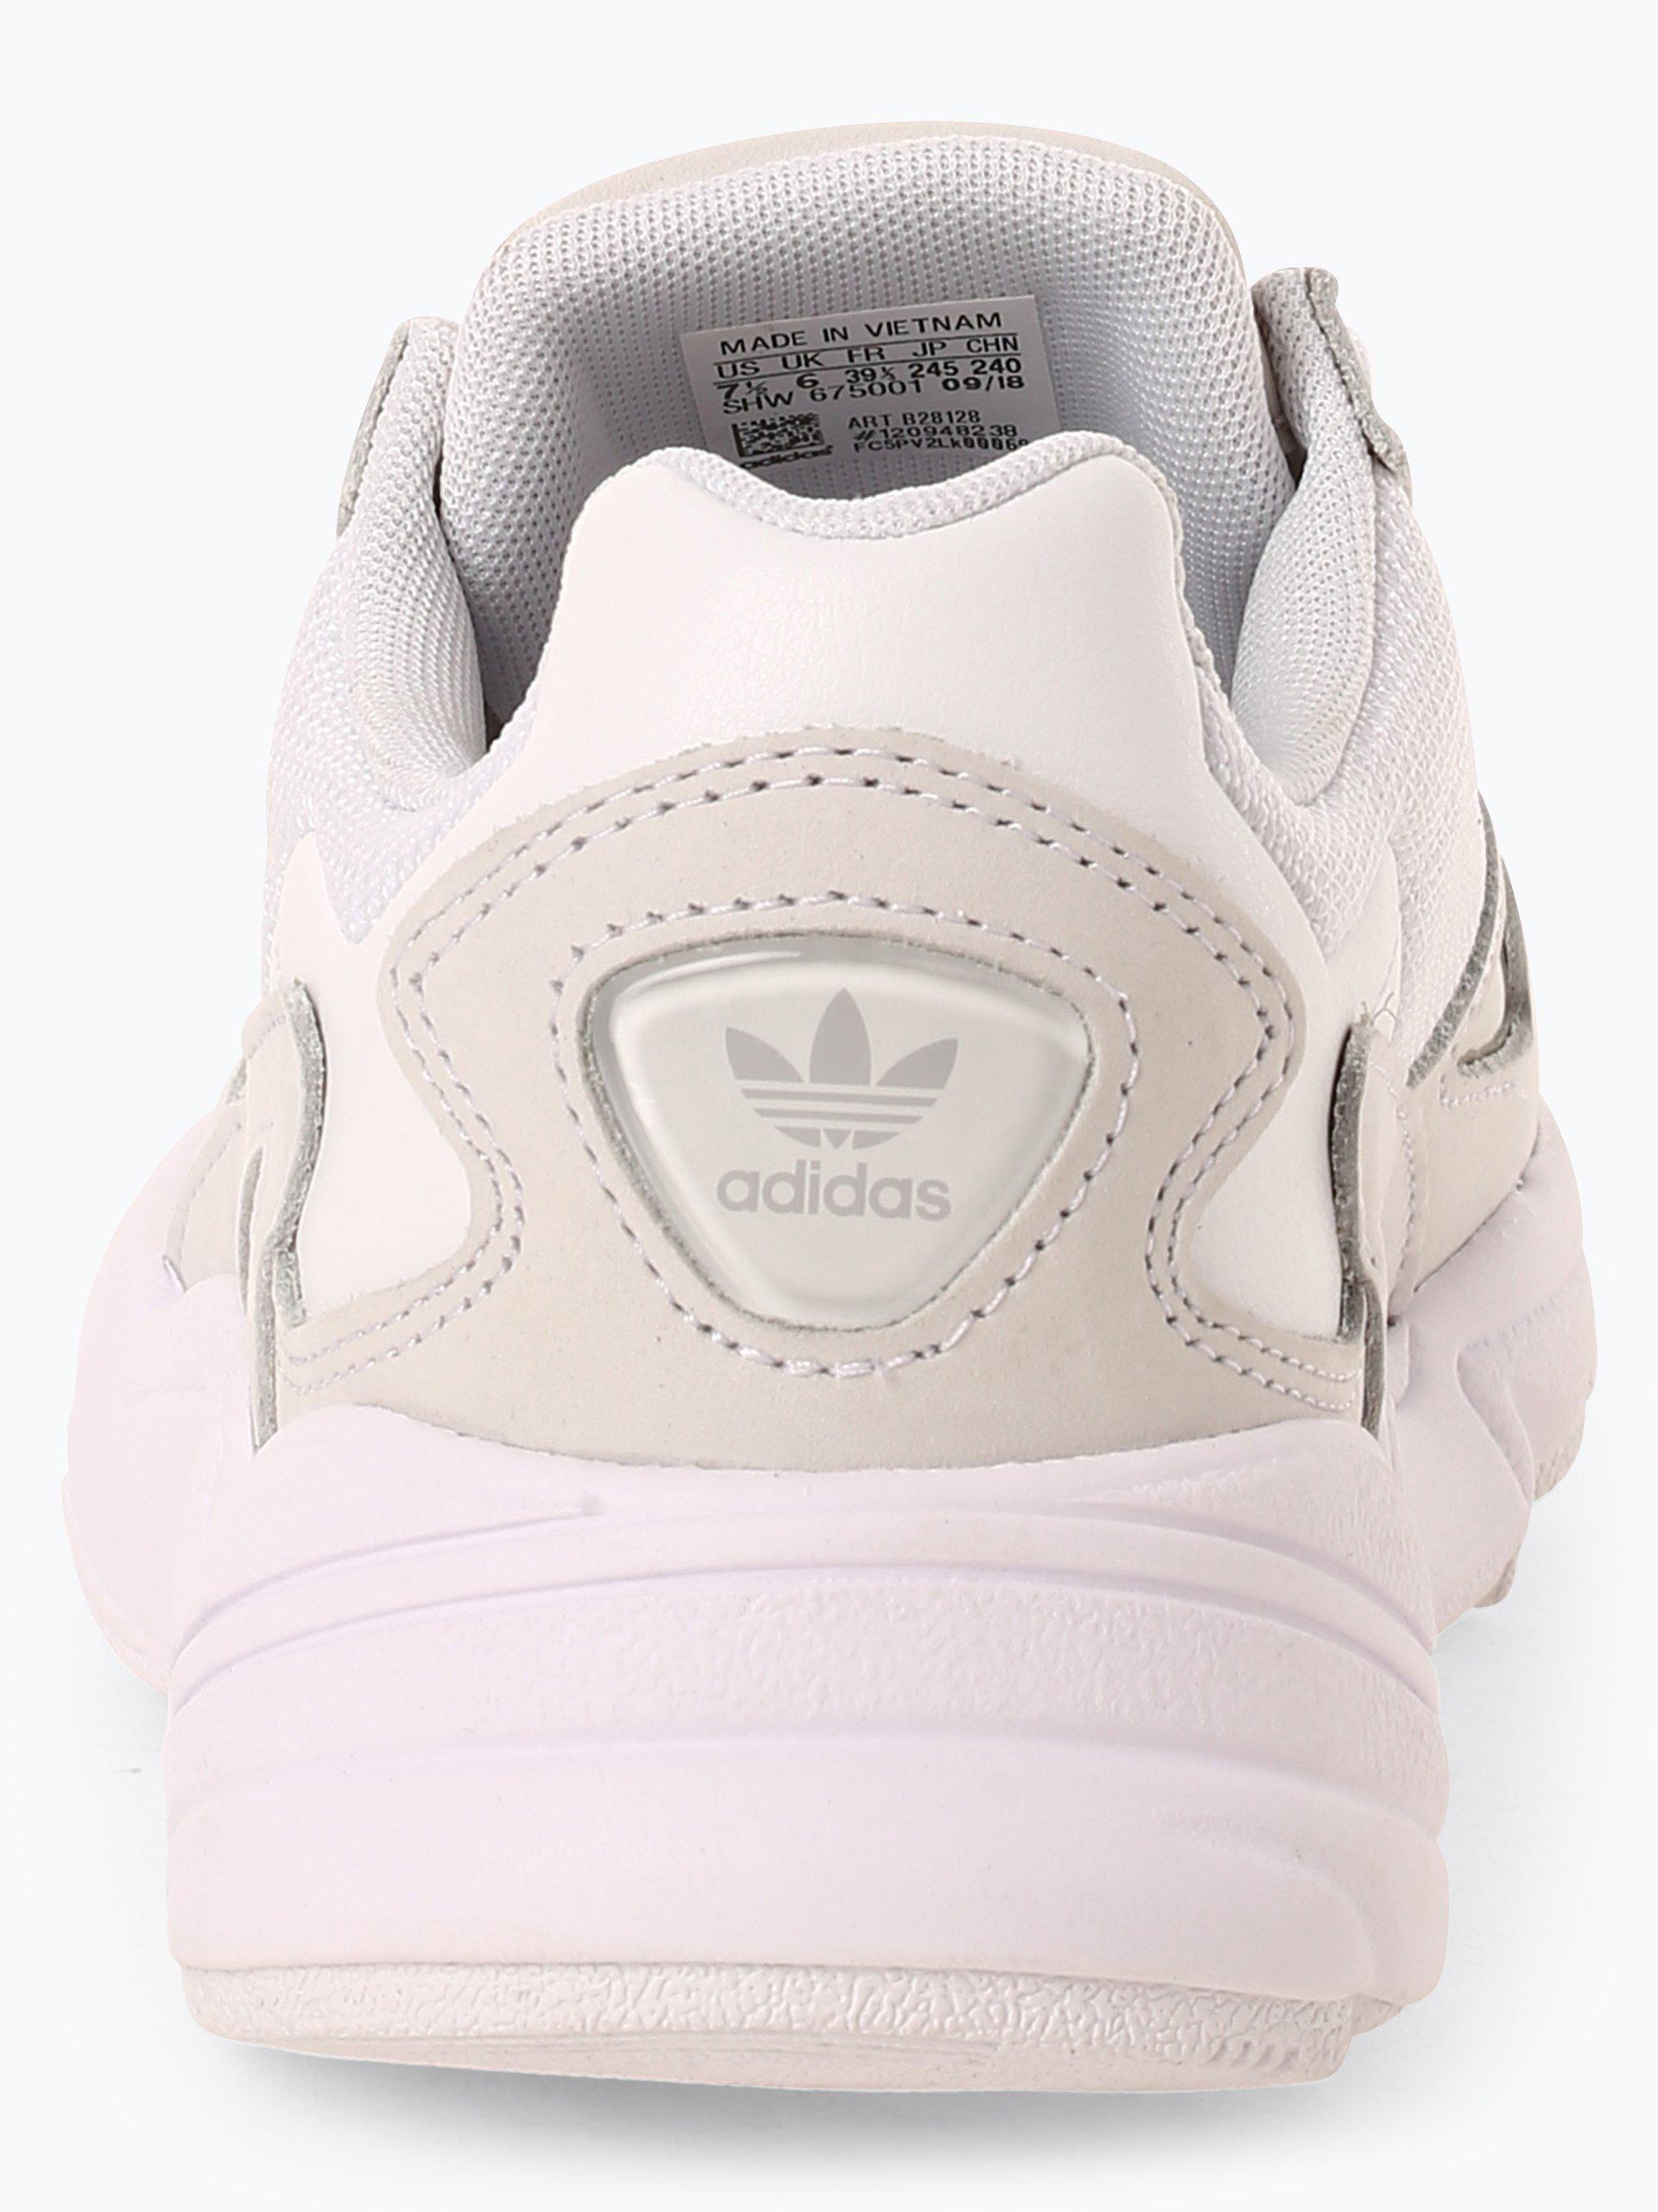 adidas Originals Damen Sneaker mit Leder-Anteil - Falcon